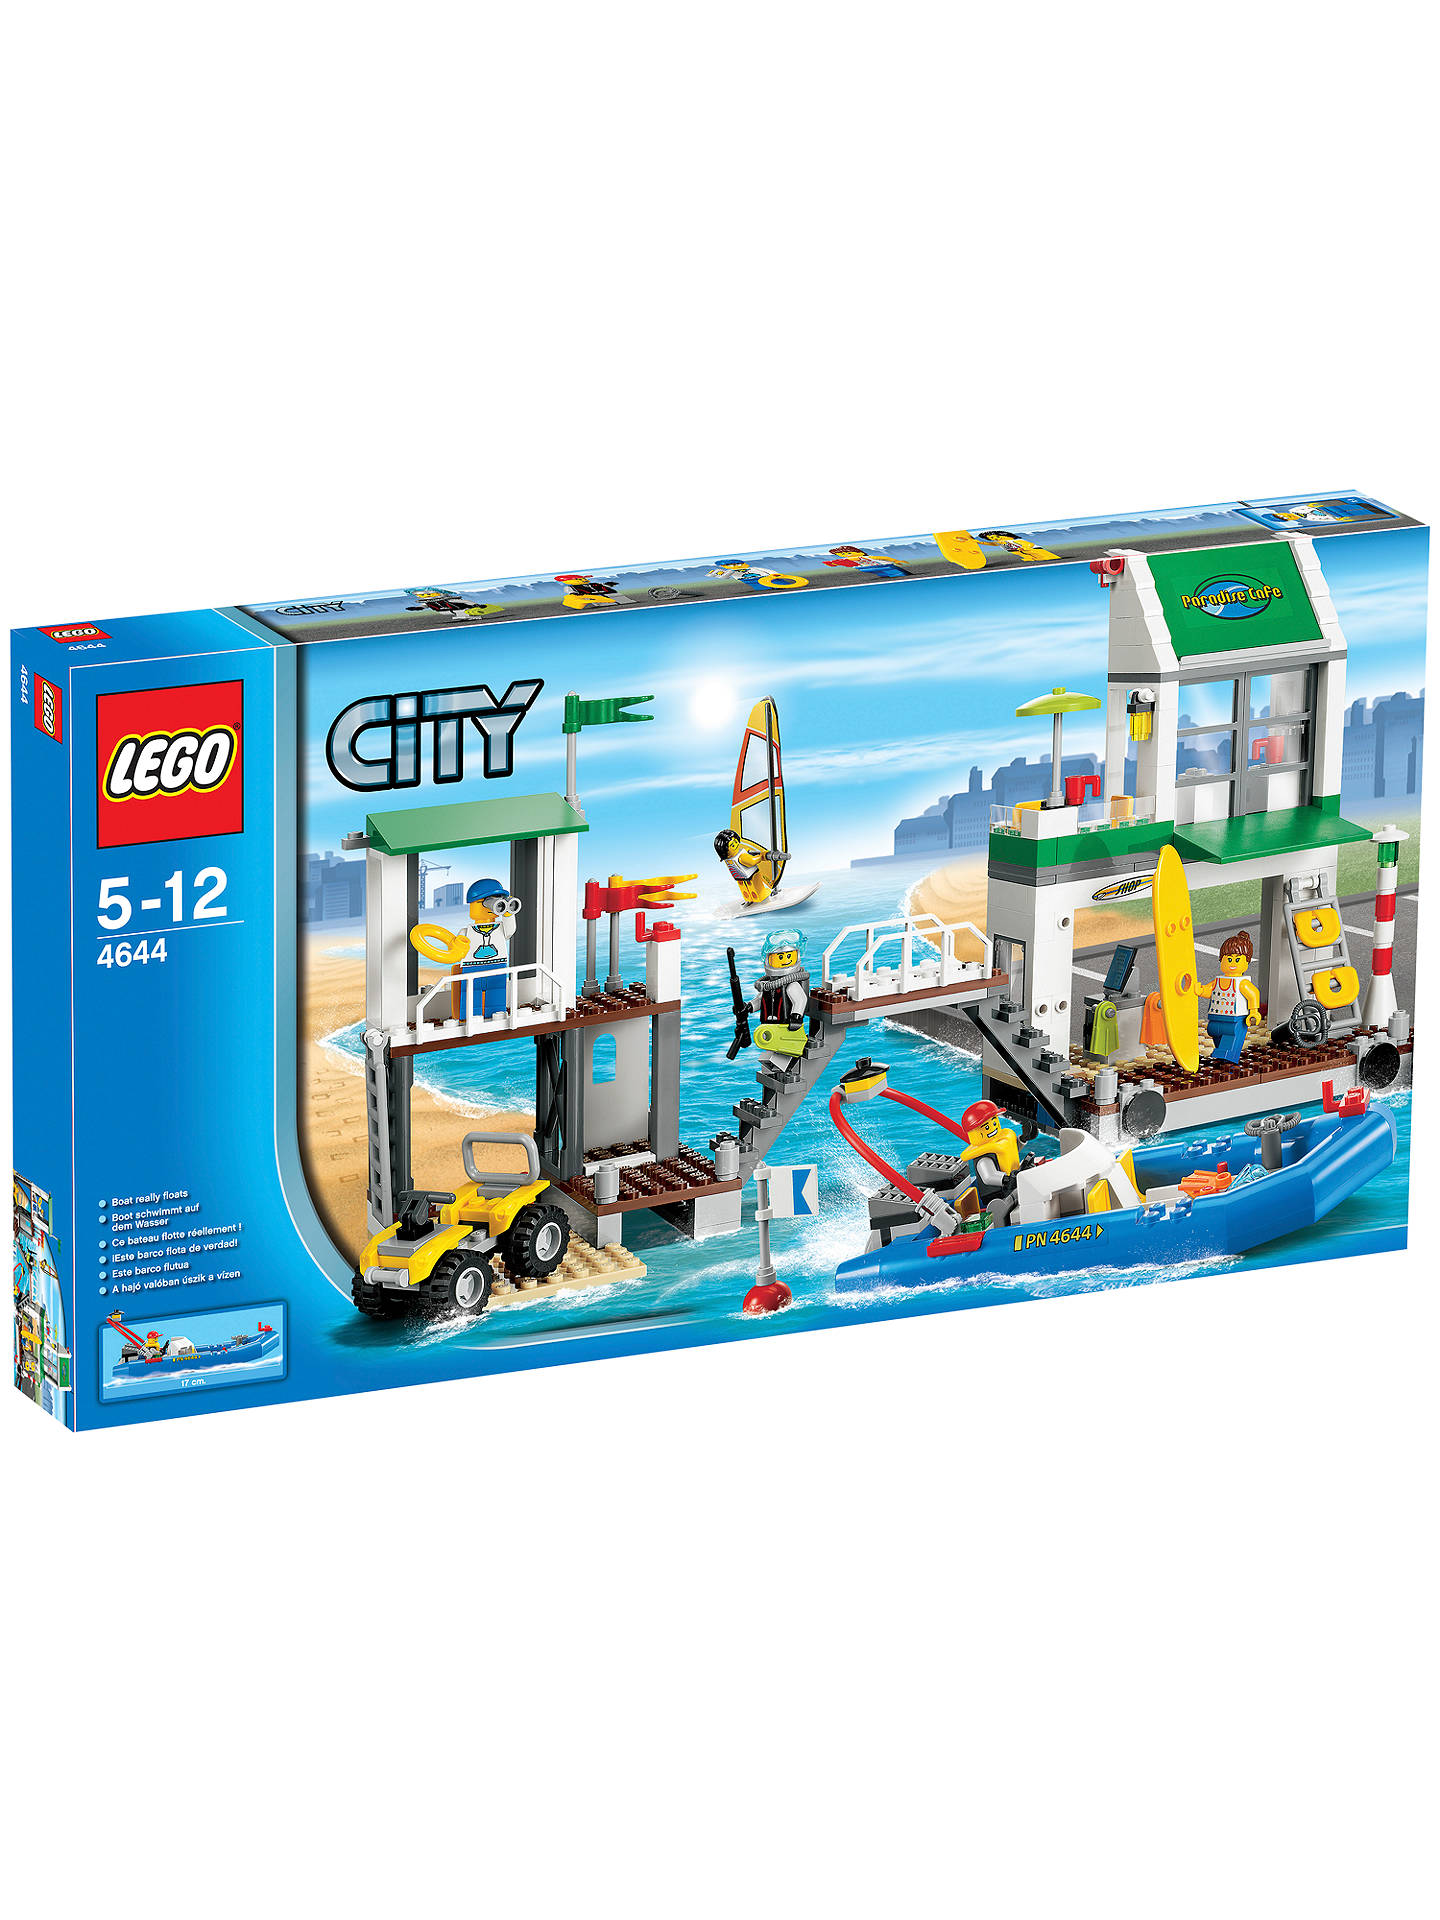 LEGO City 60130 Prison Island at John Lewis & Partners